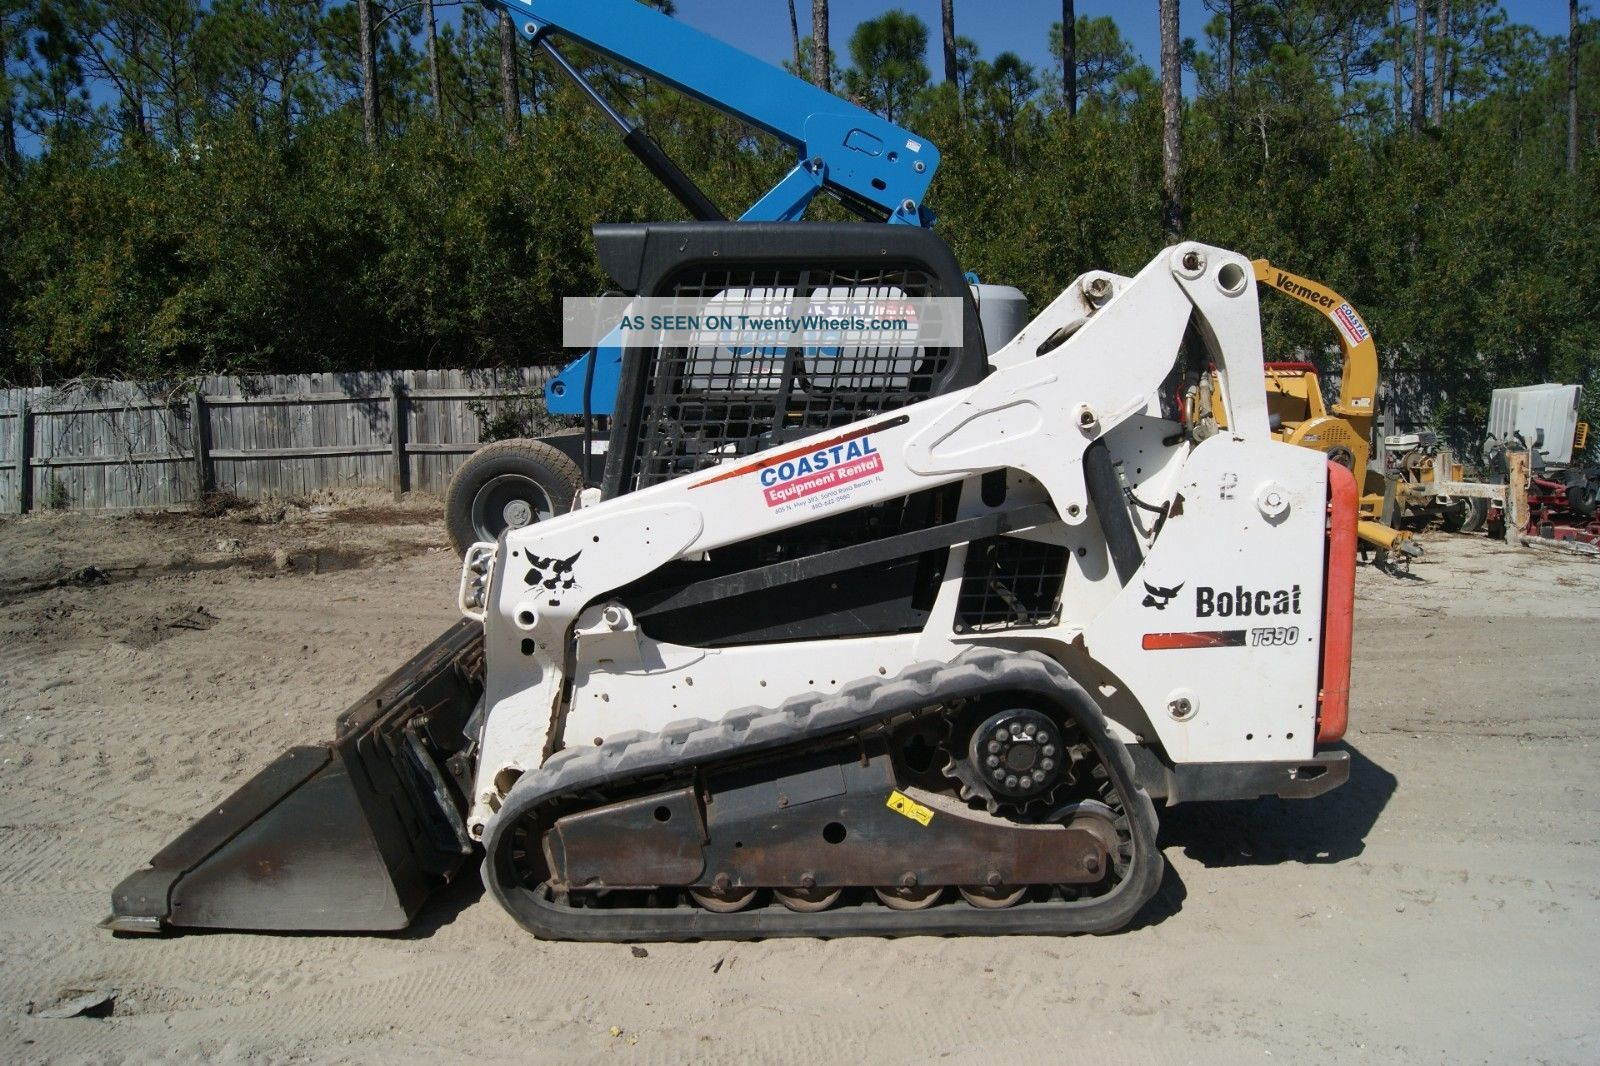 2013 Bobcat T590 Track Loader - Fully Operational & -